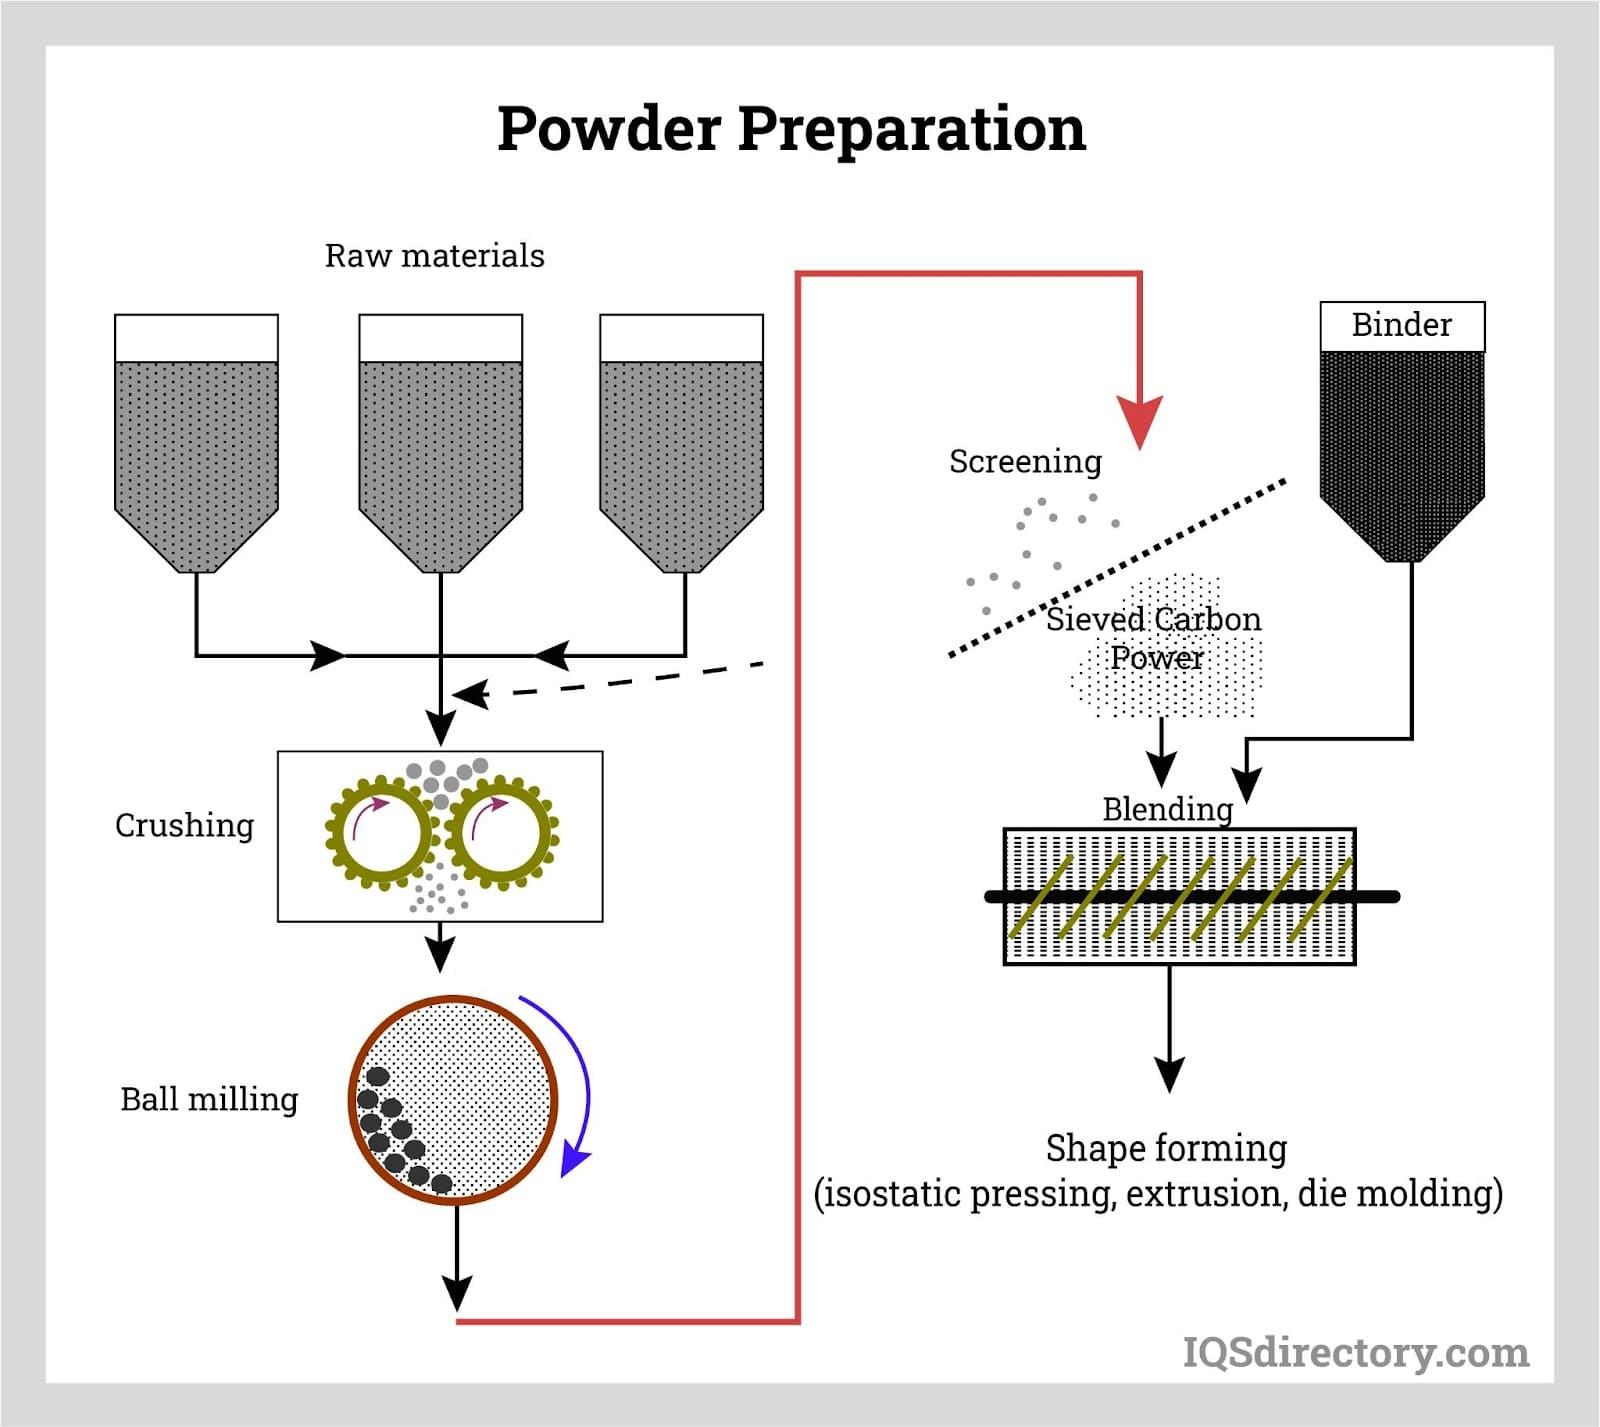 Powder Preparation